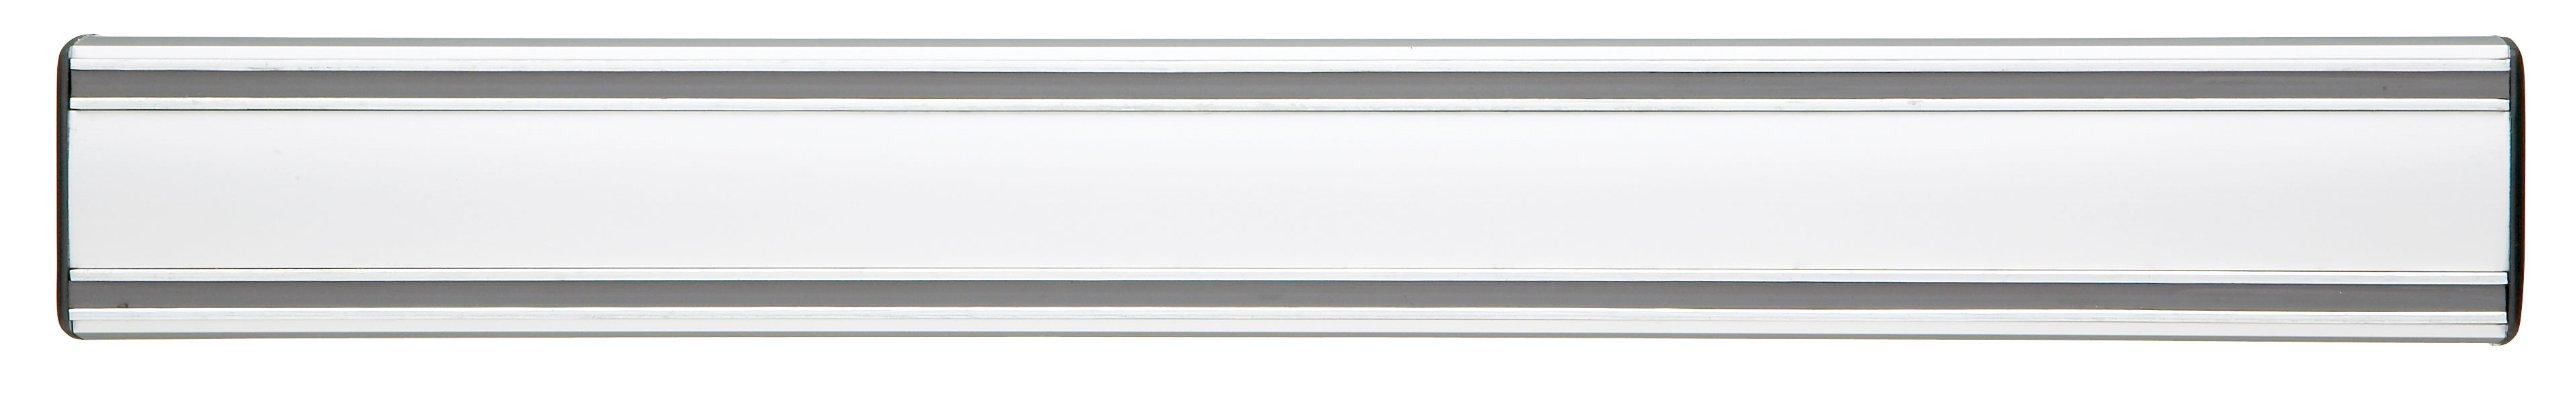 Bisbell 50 cm Classic Bisichef Professional Magnetic Knife Rack, Matt Silver